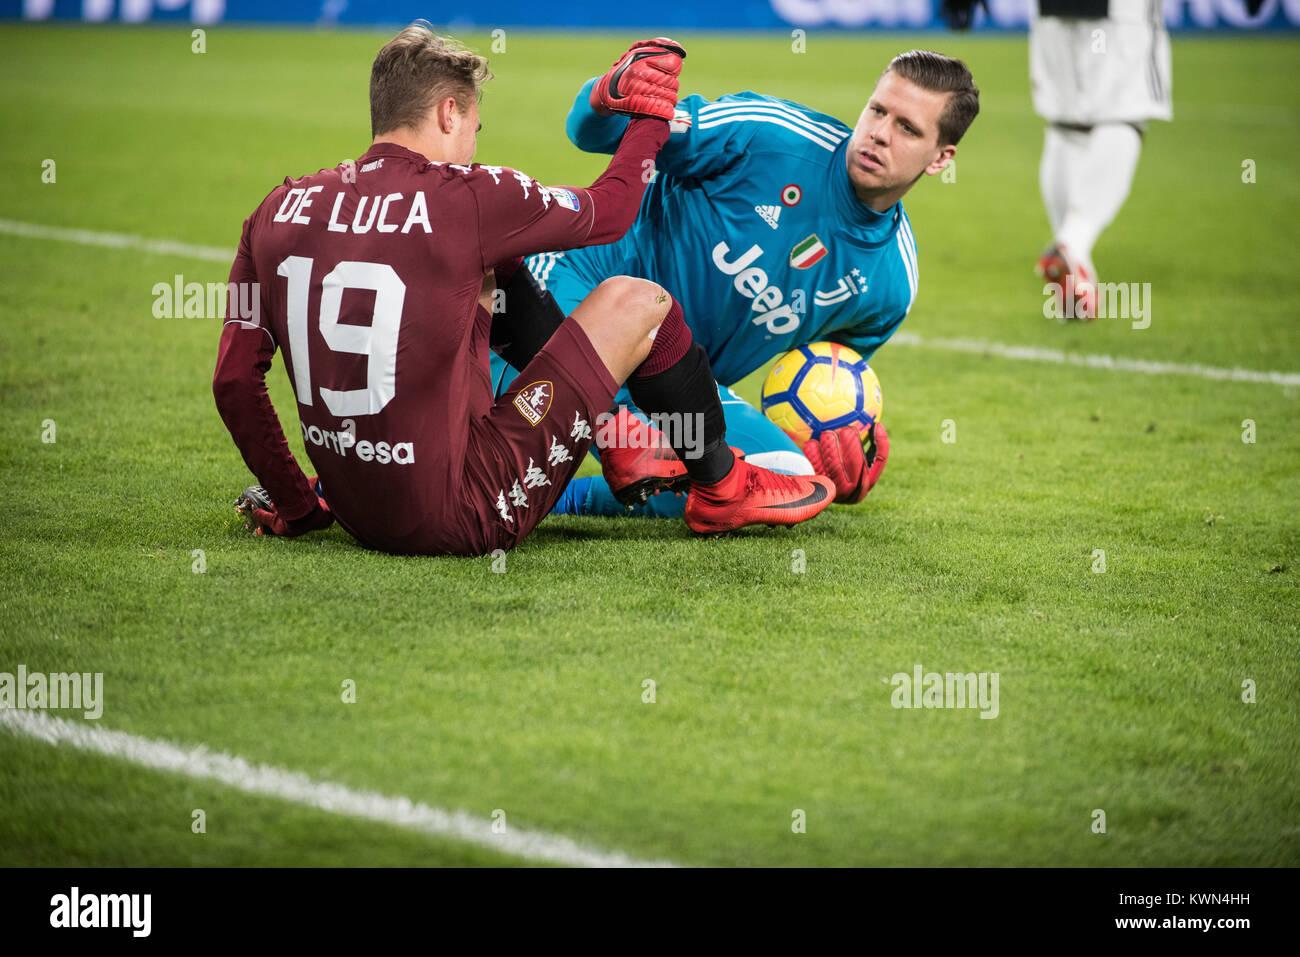 afc458c46c Manuel De Luca (Torino FC) and Wojciech Szczesny (Juventus FC) during the  Tim Cup football match Juventus FC vs Torino FC. Juventus won 3-0 in Turin